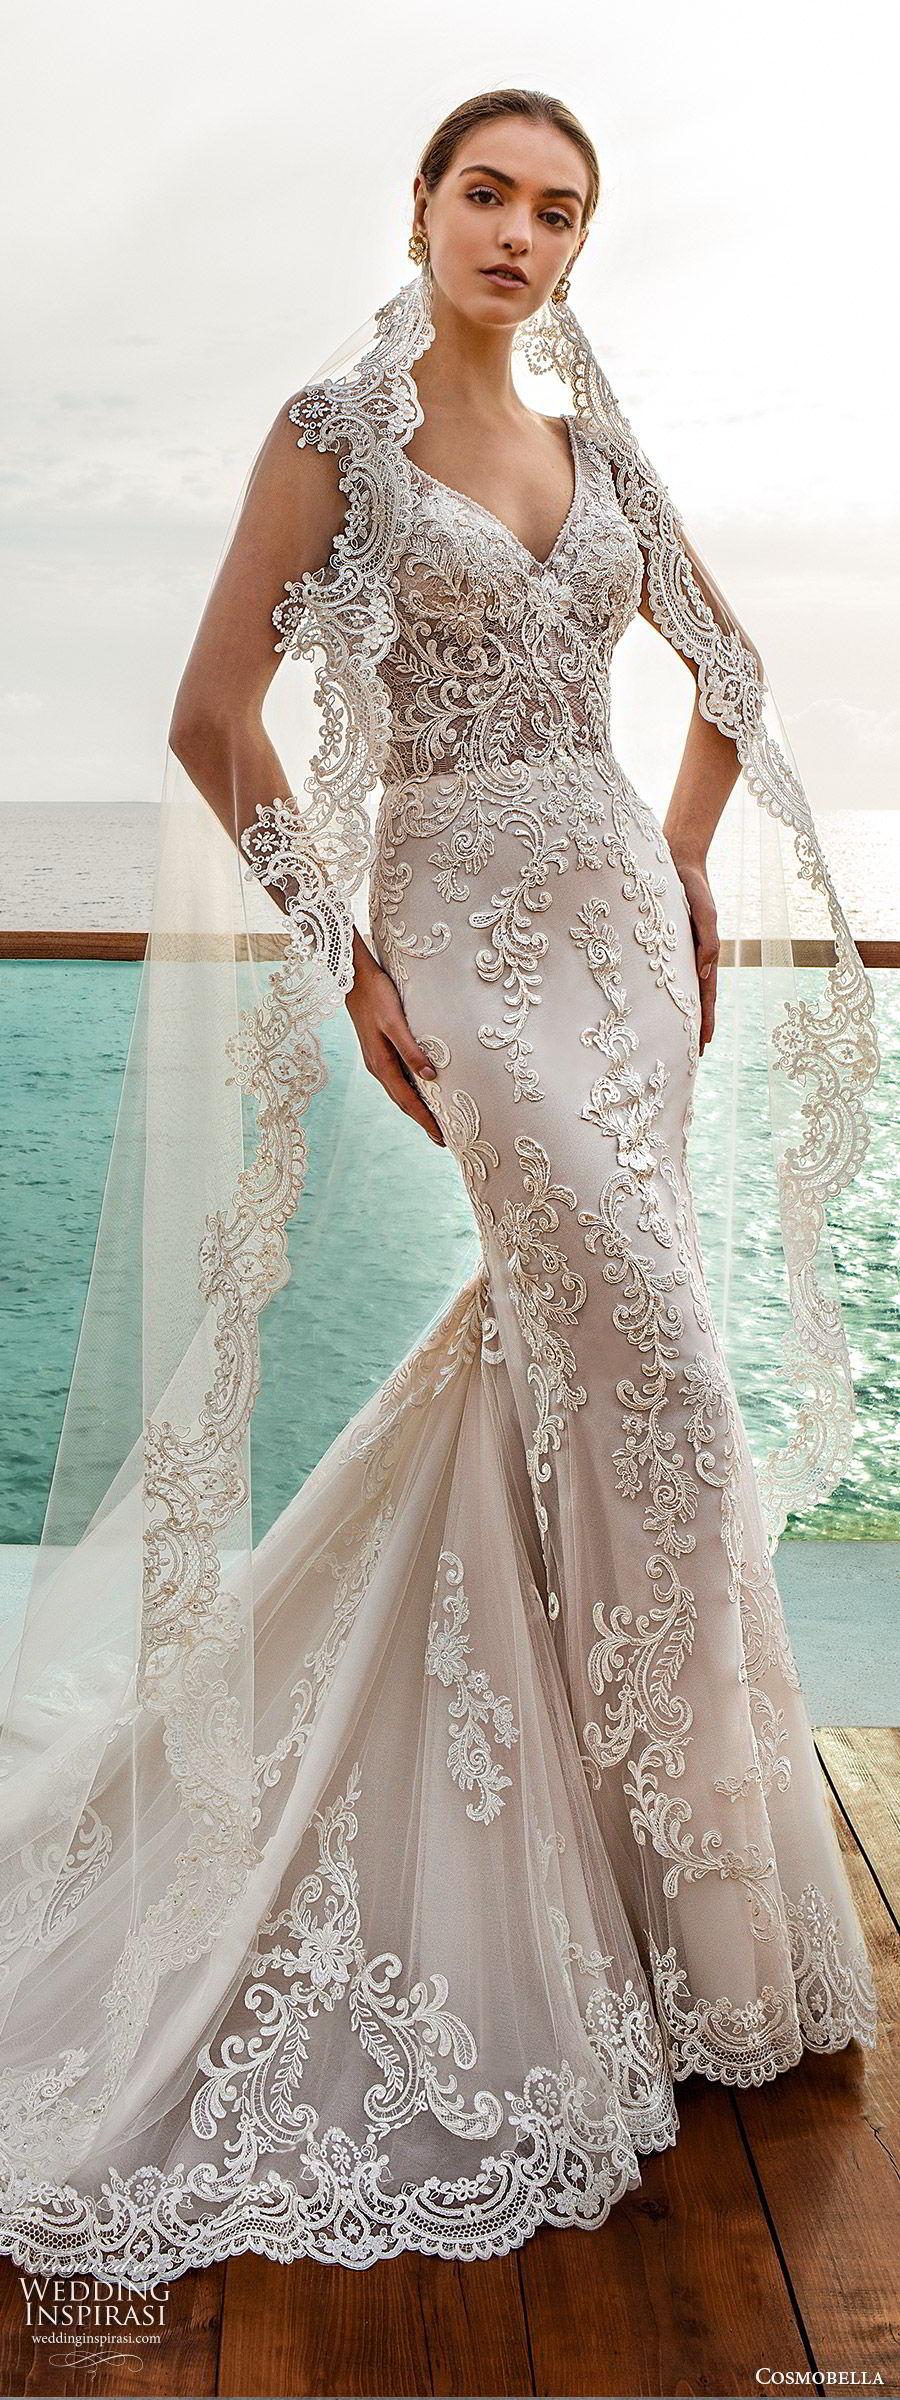 cosmobella 2020 bridal sleeveless v neckline fully embellished lace mermaid sheath wedding dress (3) low illusion back elegant glam chapel train mv